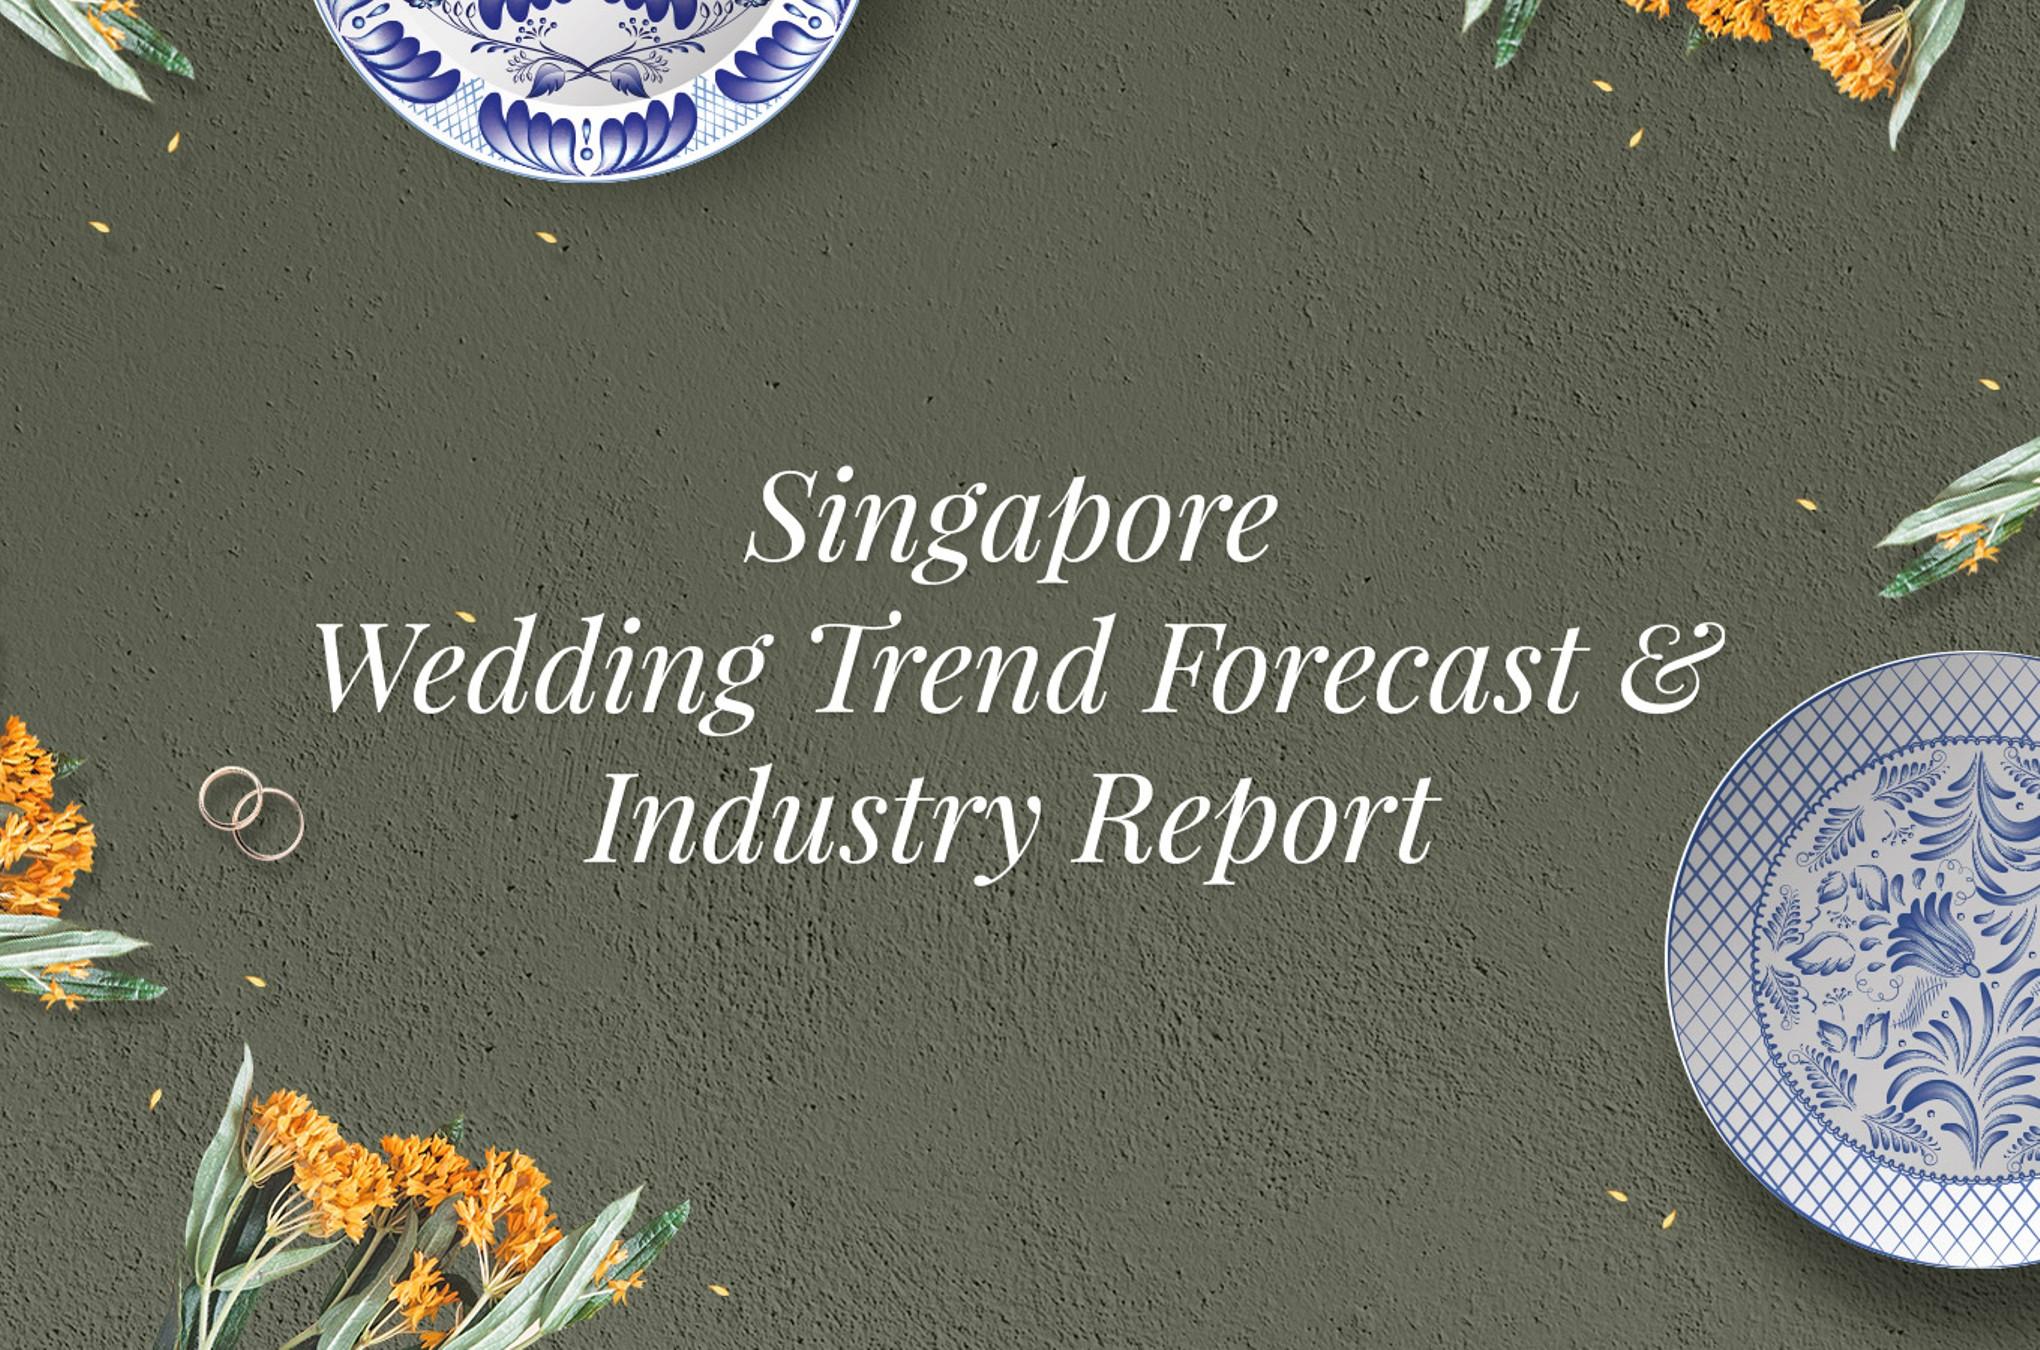 Bridestory Singapore Presents 2019 Wedding Trend Forecast 2018